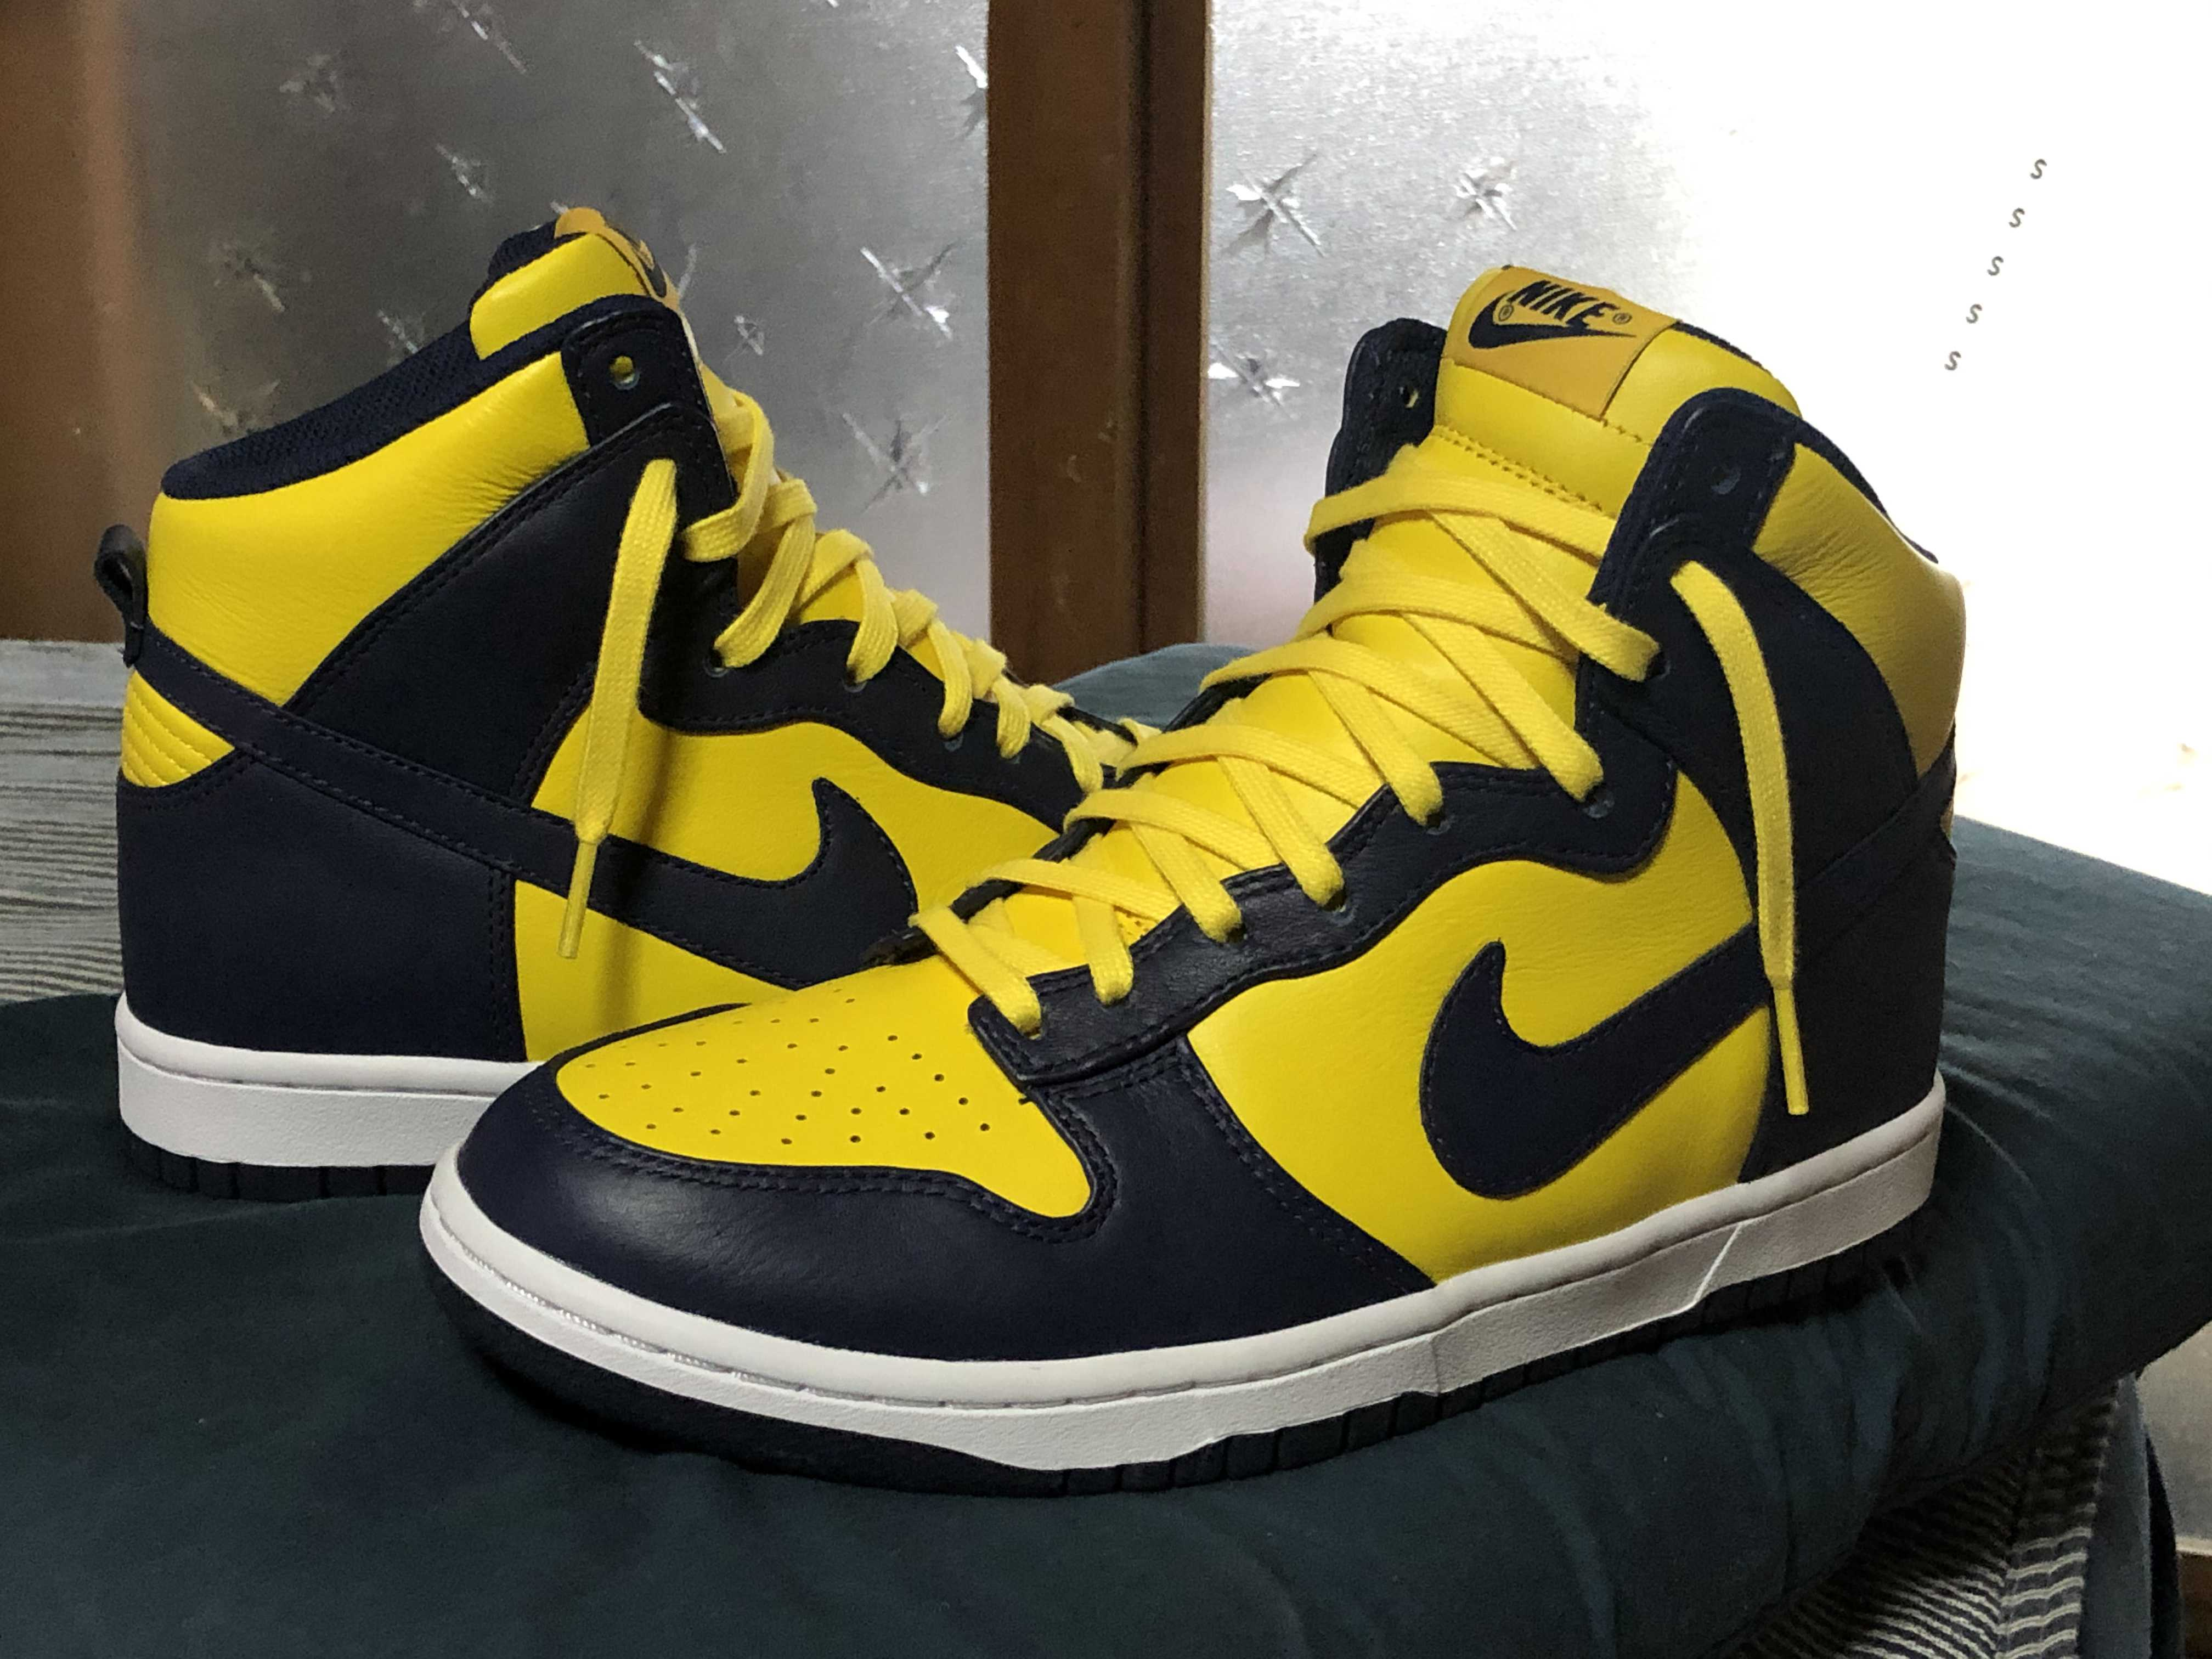 Nike×sacai DUNK high lux Michigan